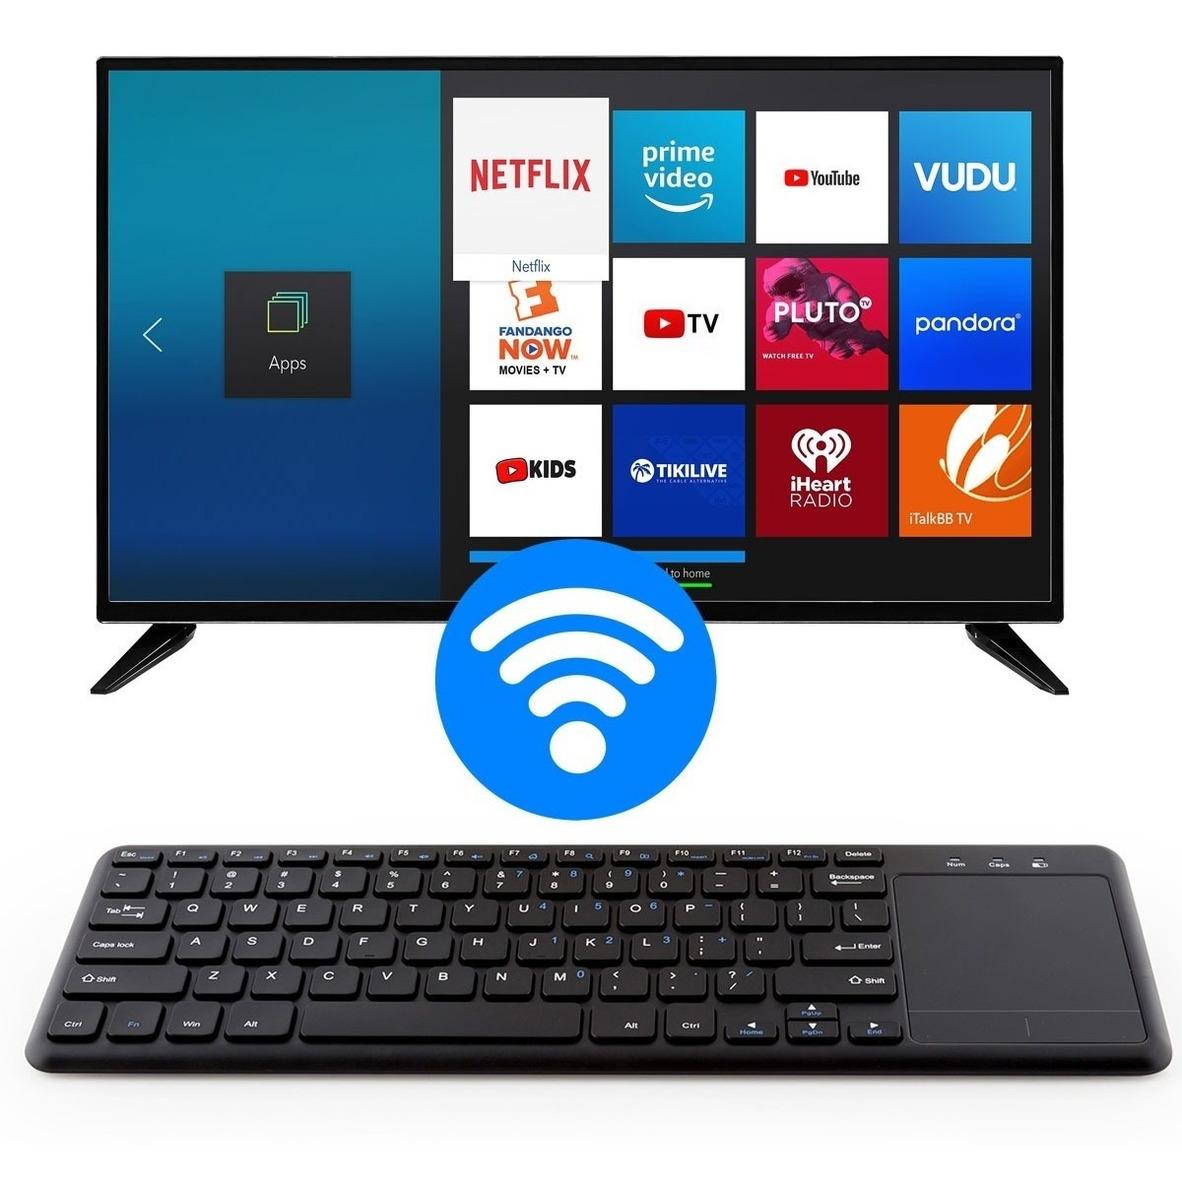 Teclado Inalambrico 2 4 Ghz Usb Smart Tv Pc Laptop Multimedi